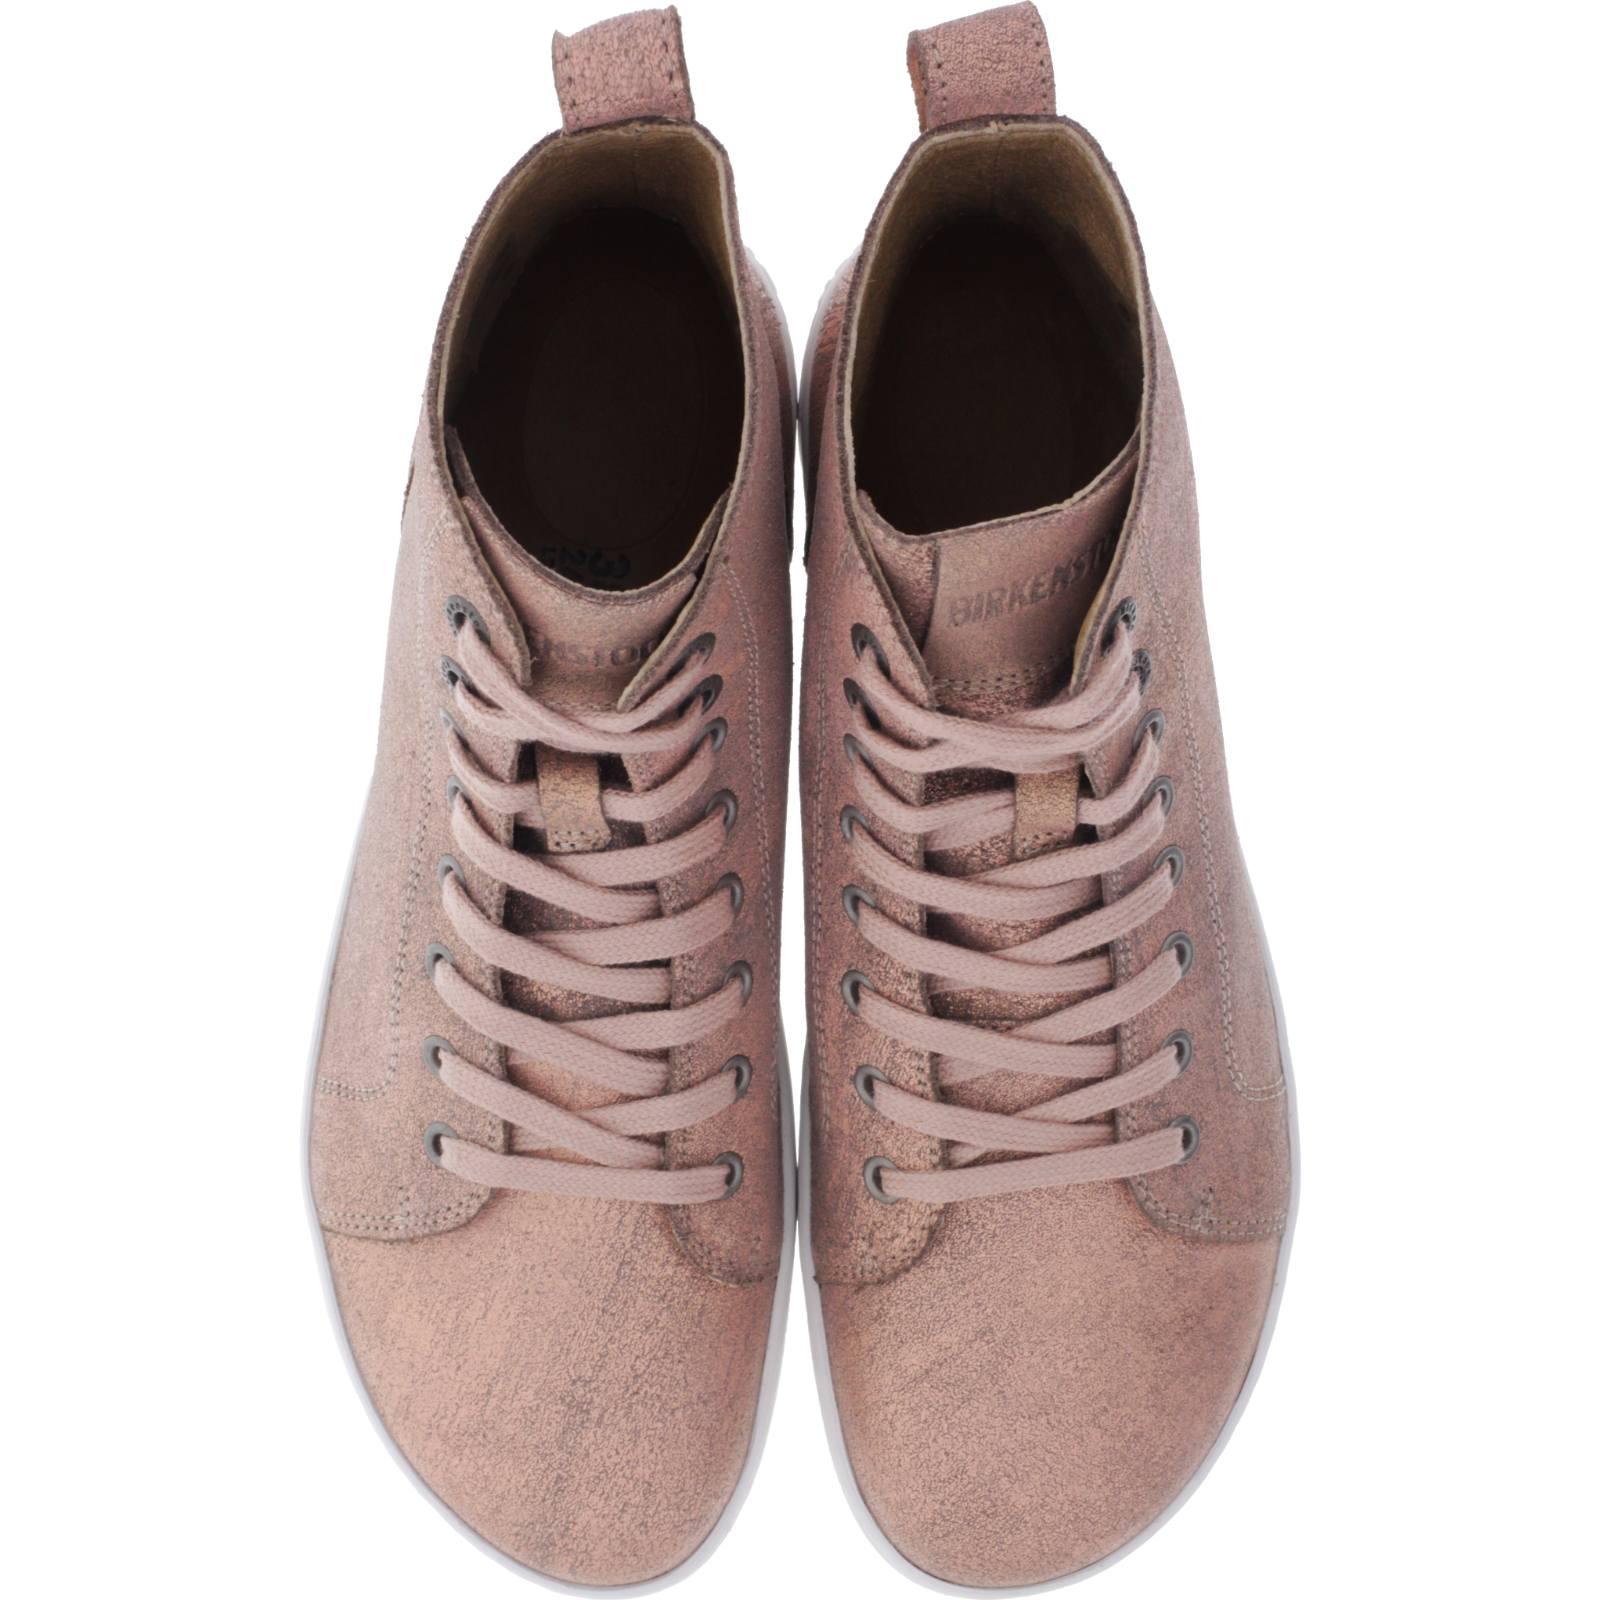 315285d8658cf9 ... Vorschau  Birkenstock Shoes   Modell  Bartlett   Metallic Rose   Leder    Weite  ...